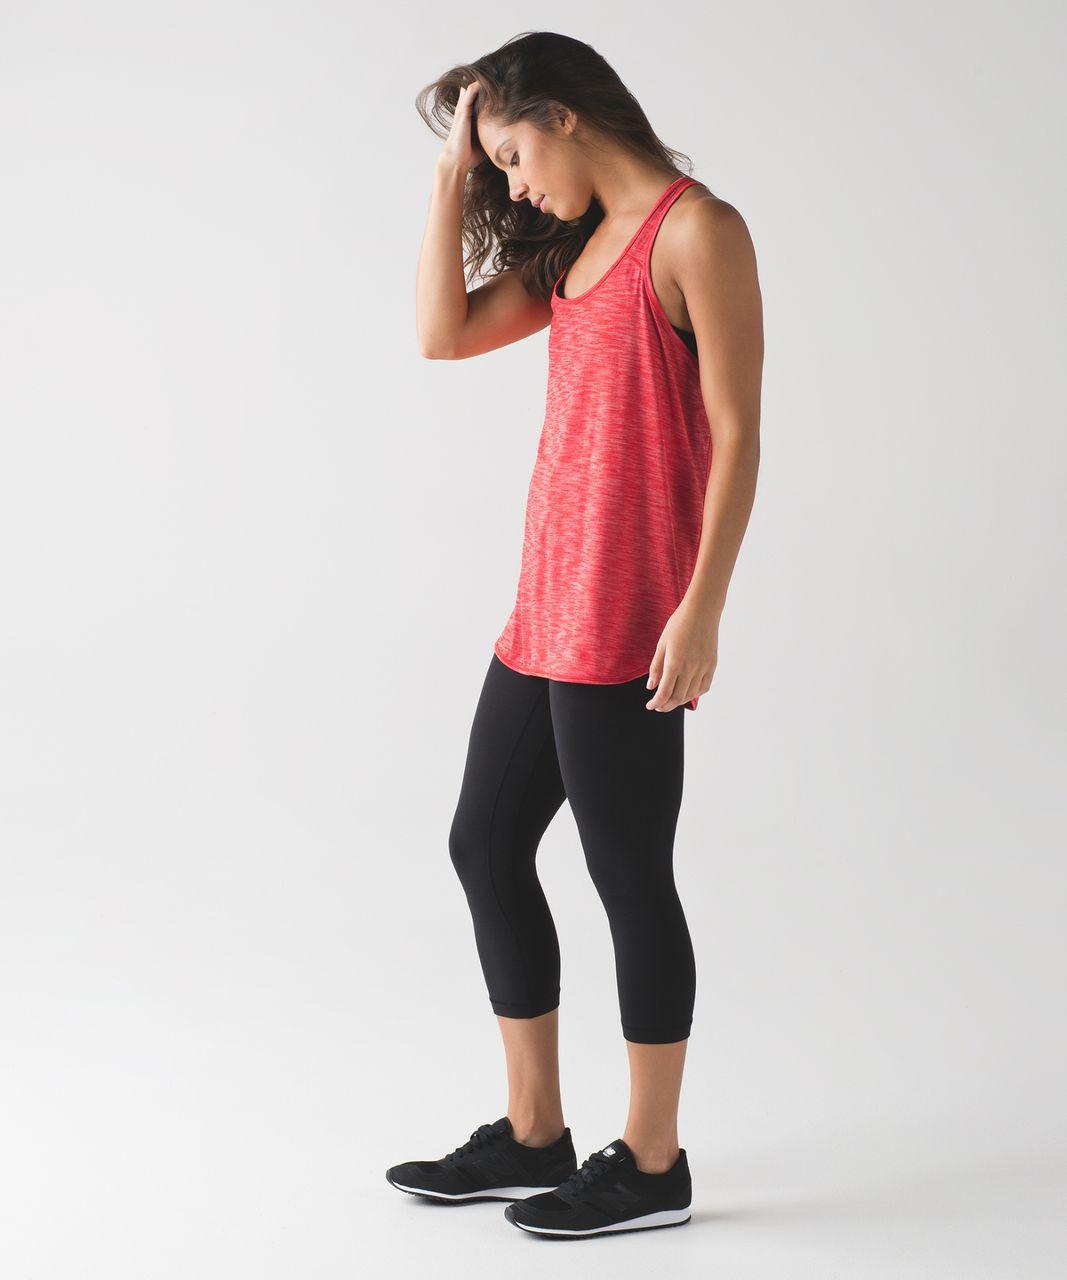 Lululemon Essential Tank - Heathered True Red